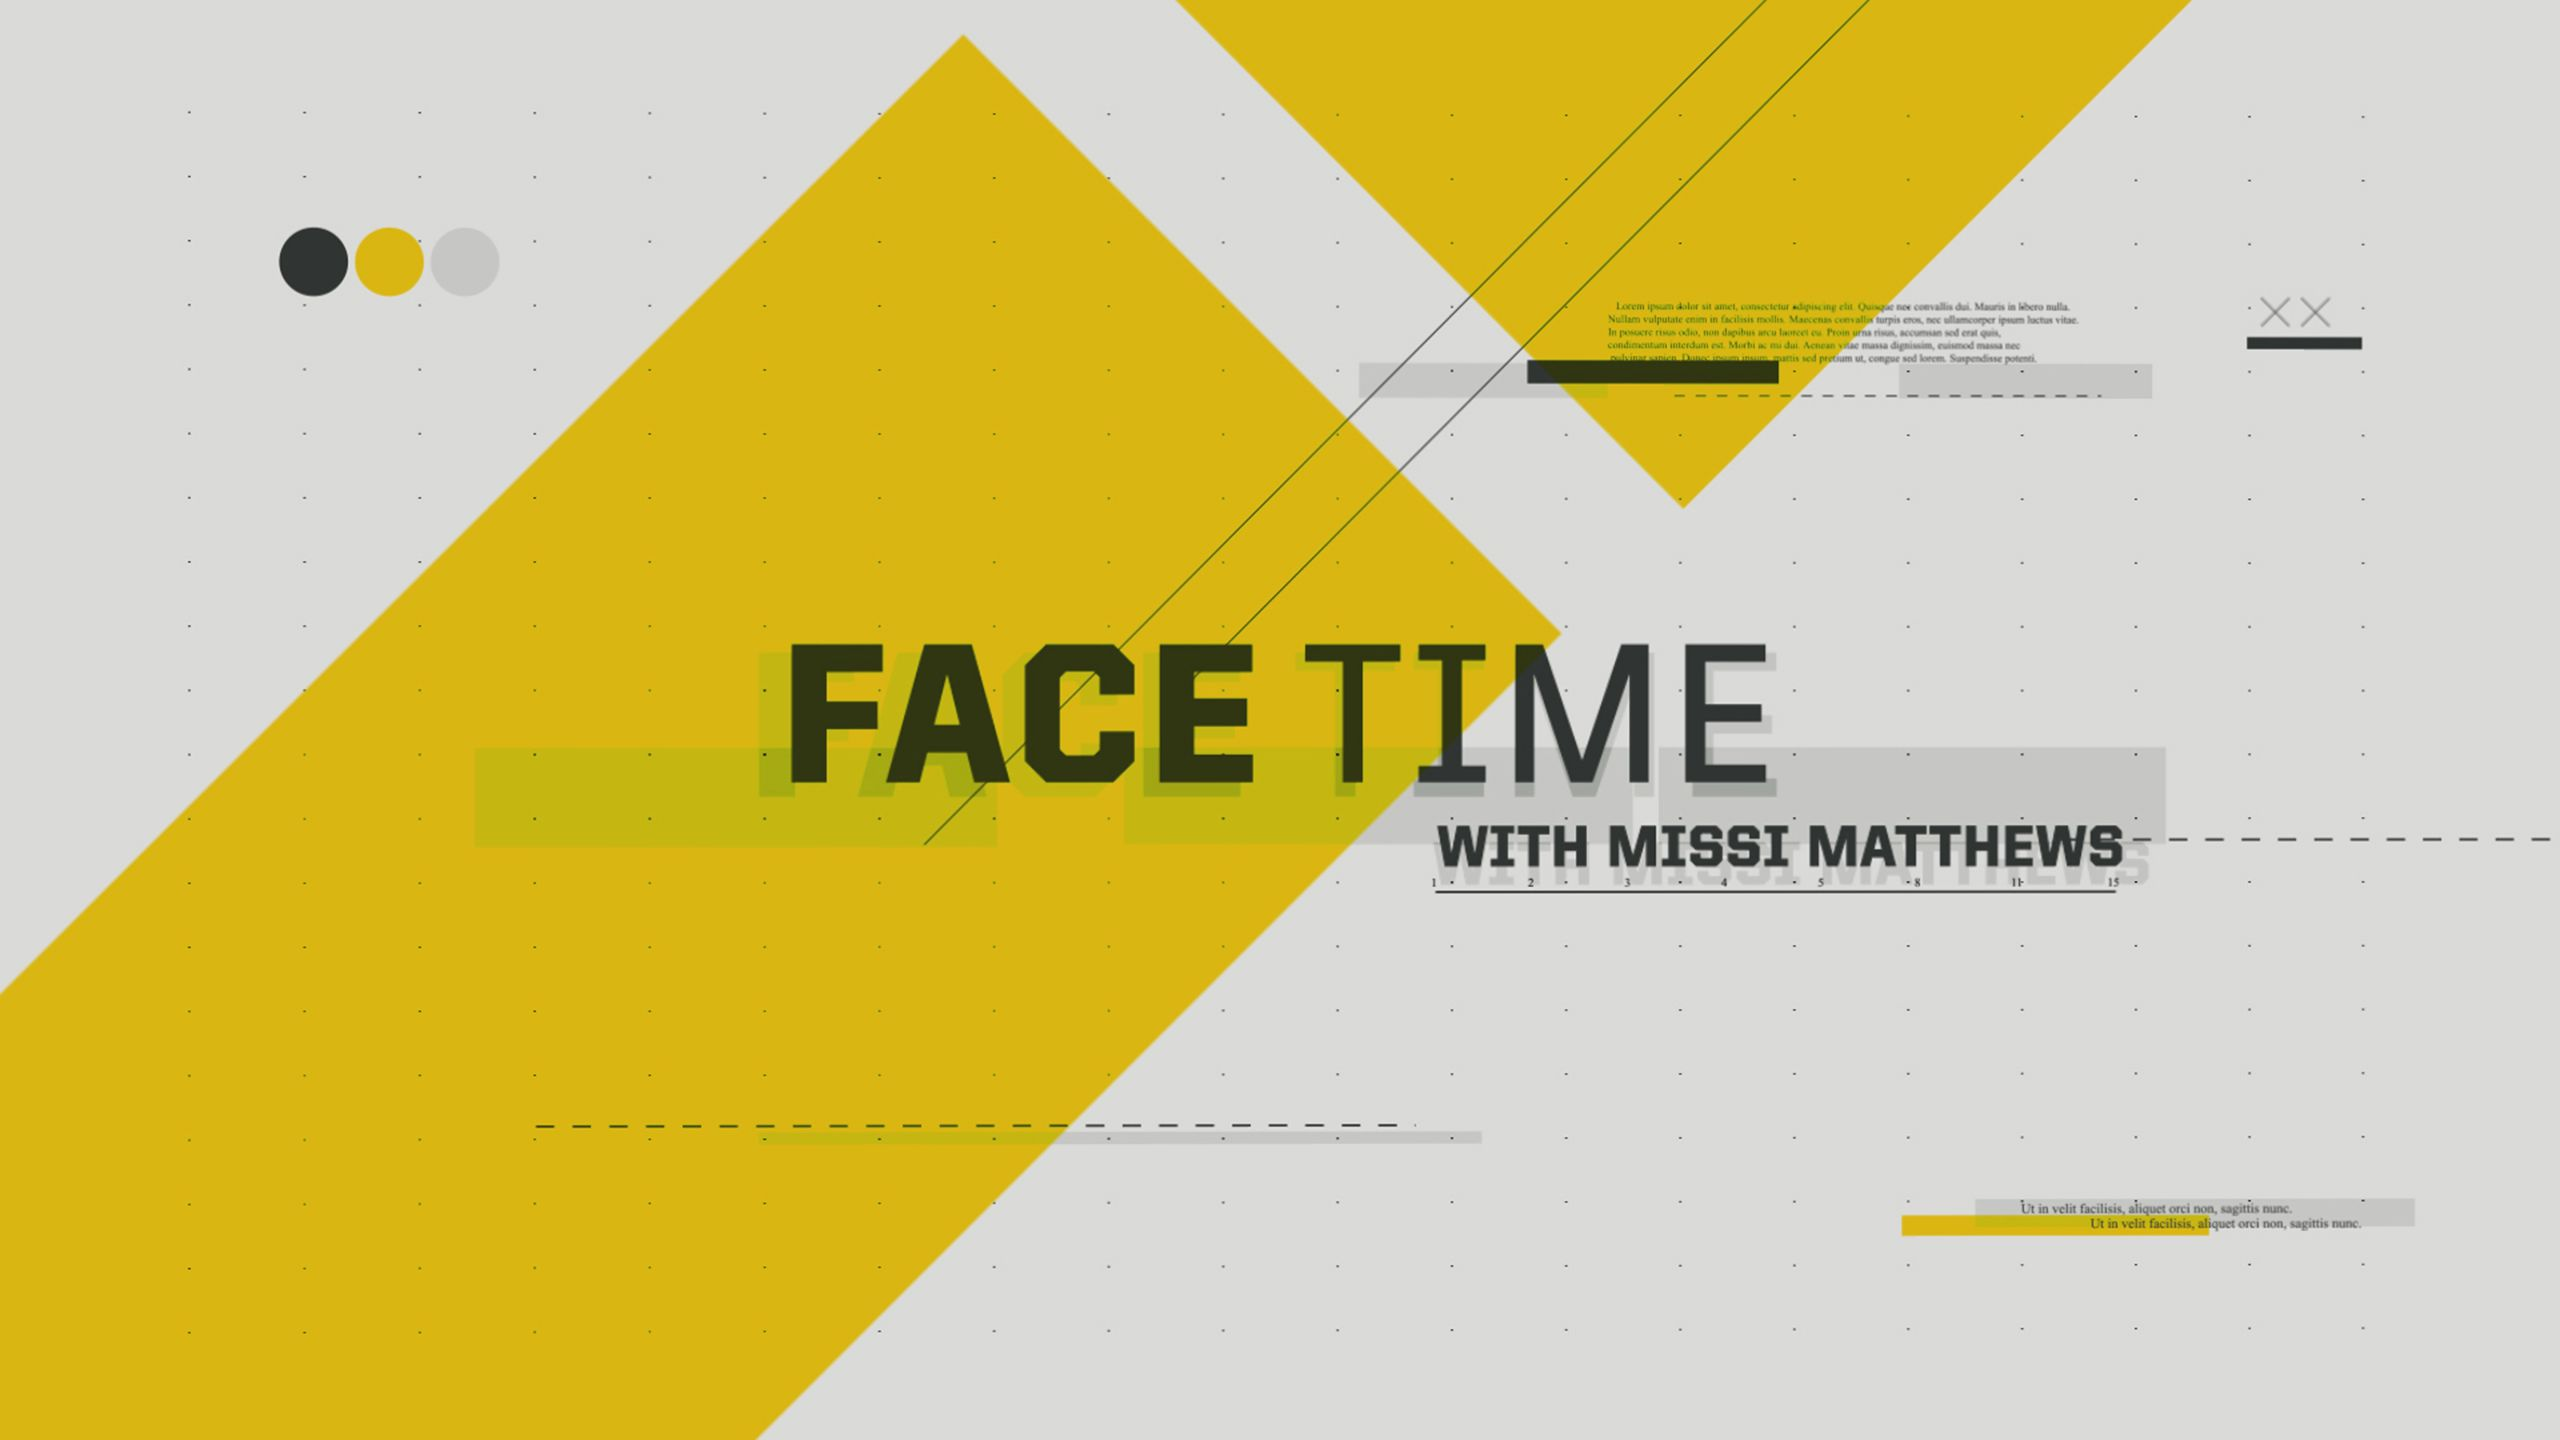 SNR_FaceTime_Podcast-2560x1440